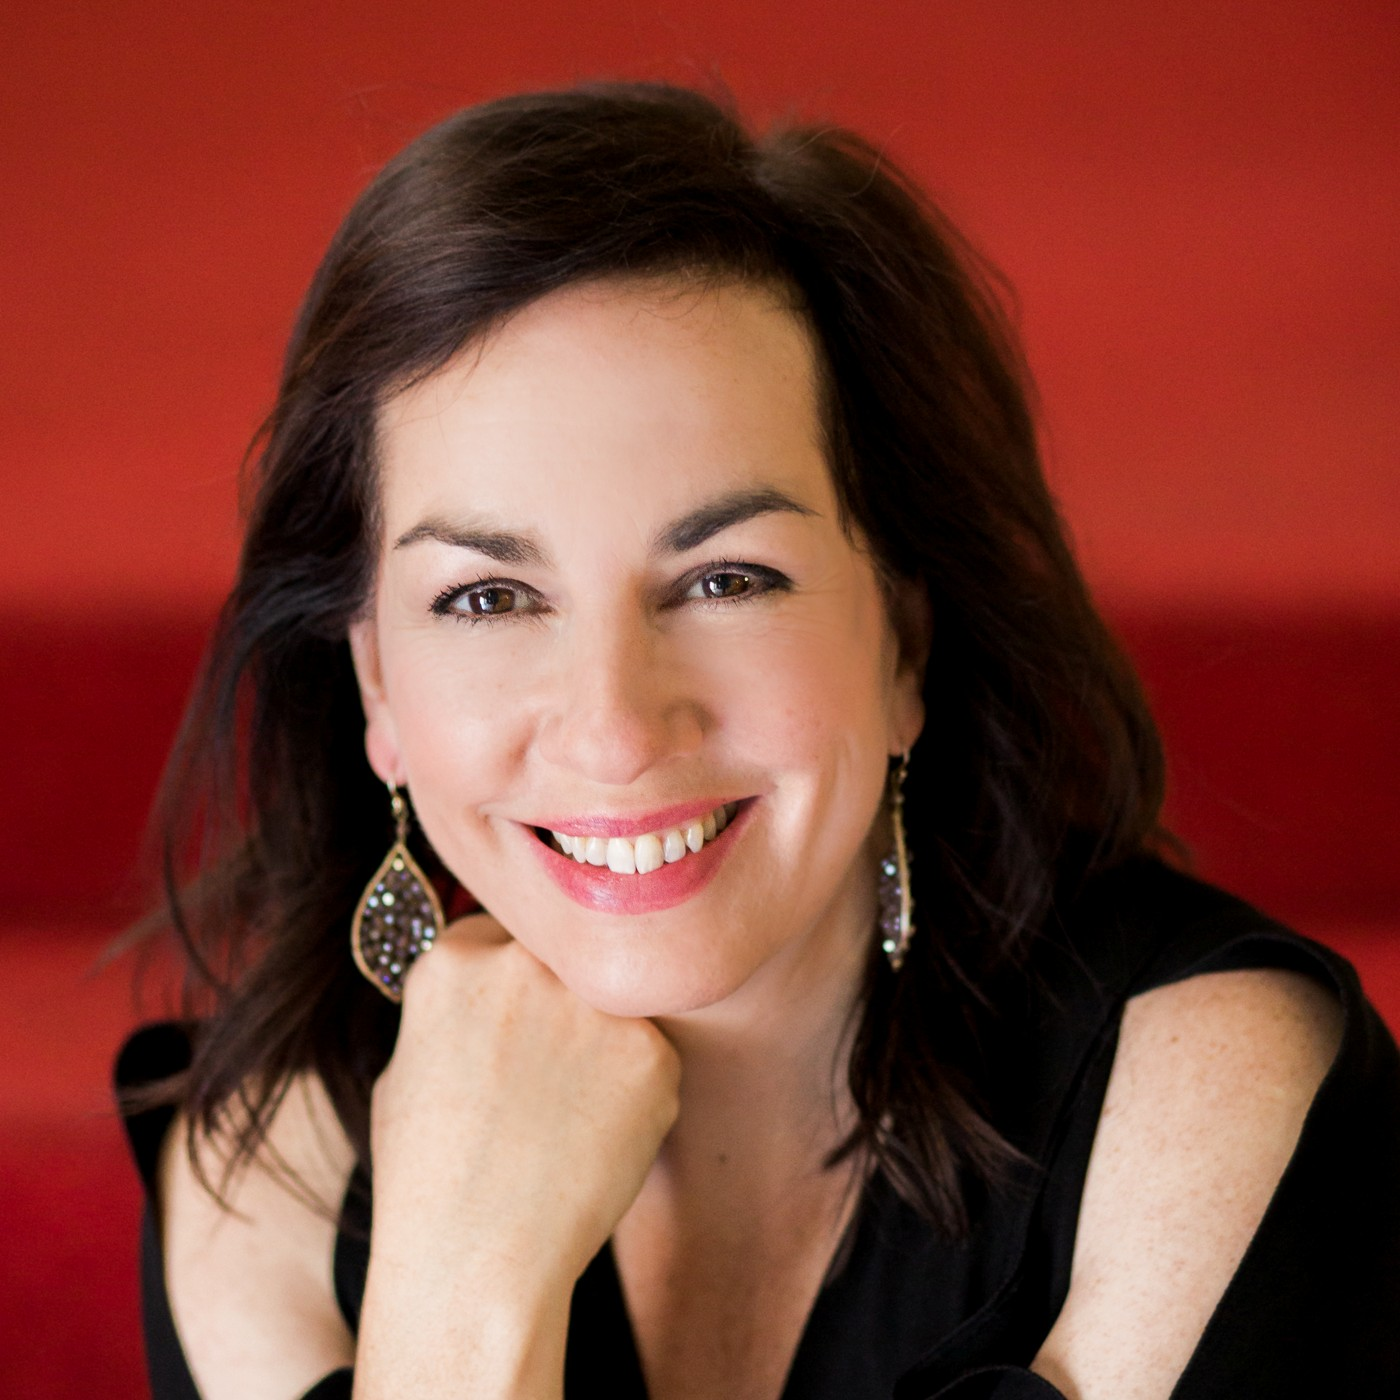 Marie-Hélène Bernard President and CEO, St. Louis Symphony Orchestra